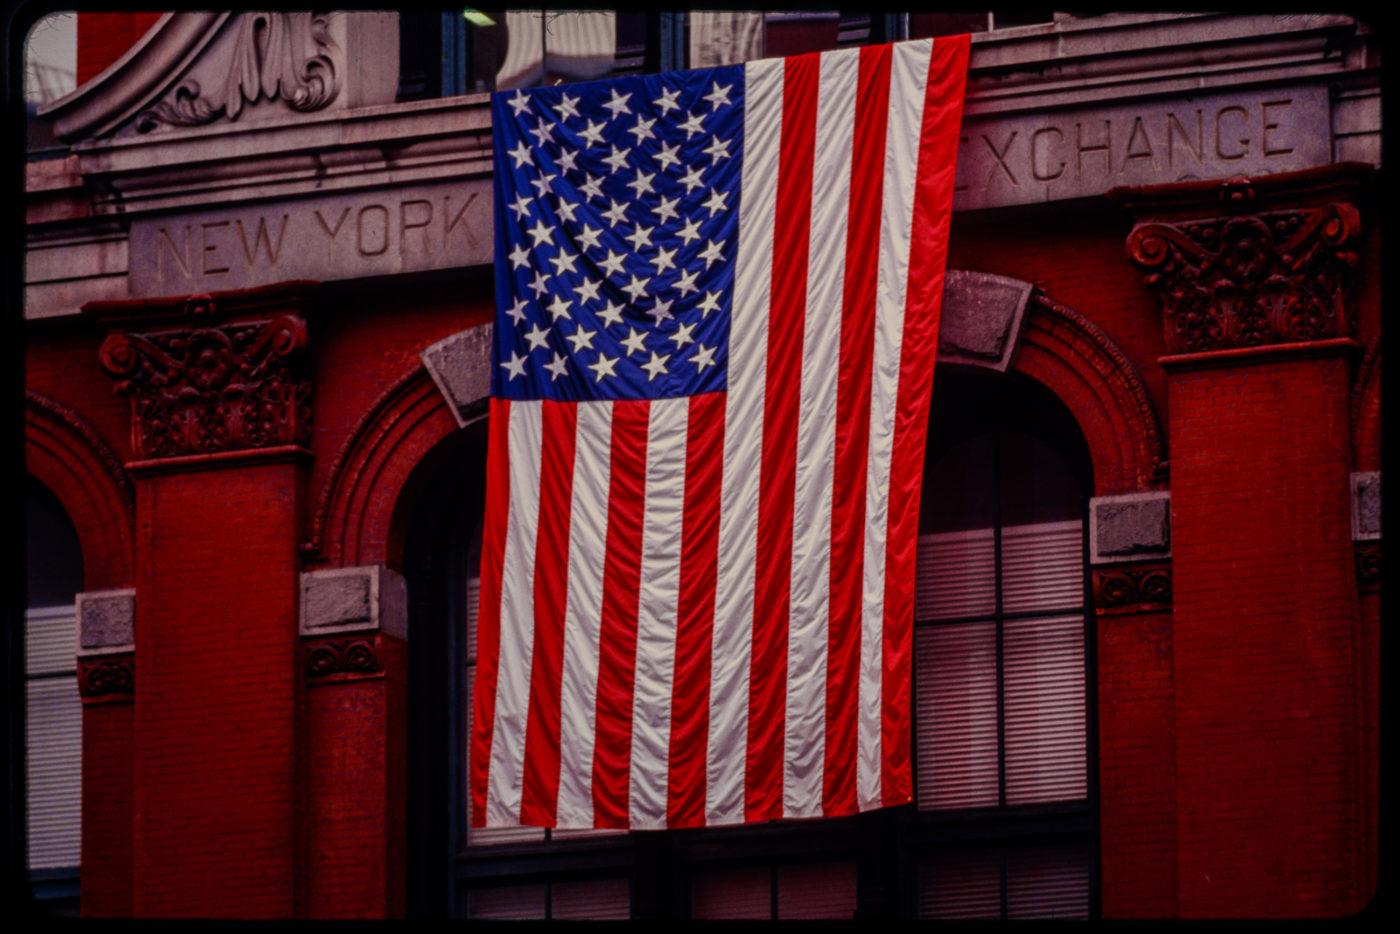 (Now Former) New York Mercantile Exchange Buidling on Harrison Street Displaying an American Flag.jpg